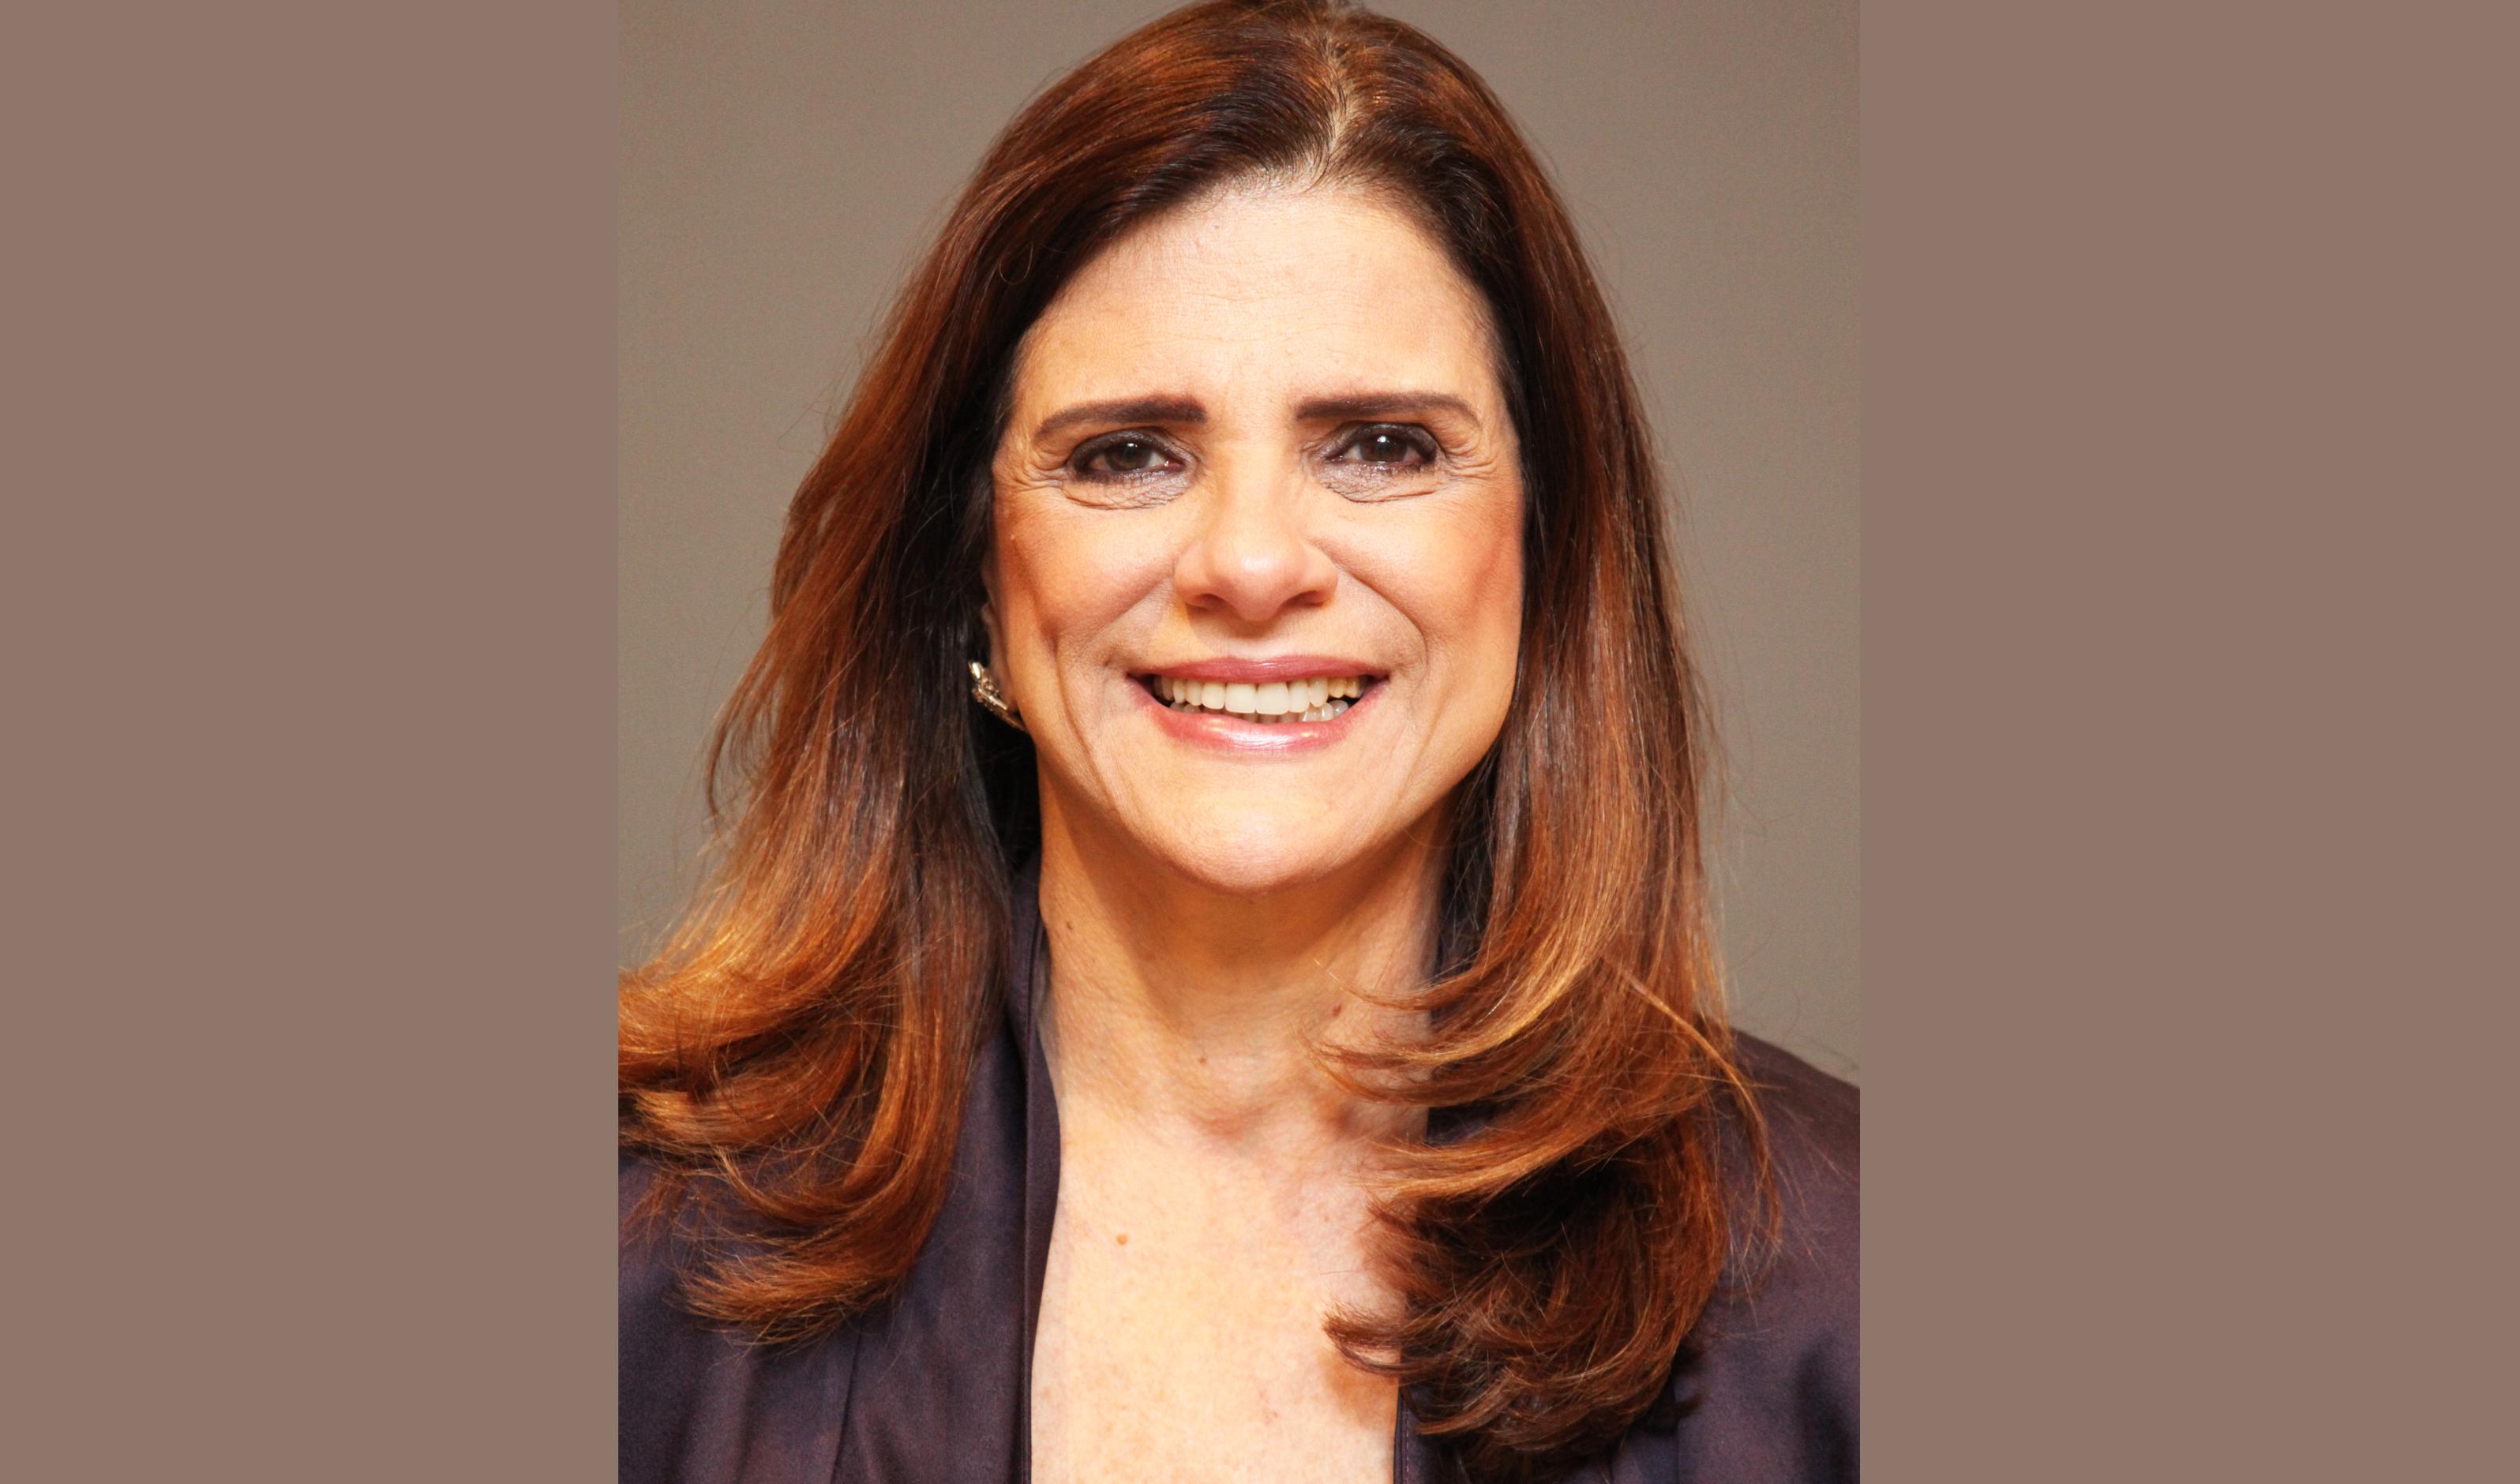 Perfil do Acadêmico/Abril – Solange Beatriz Palheiro Mendes